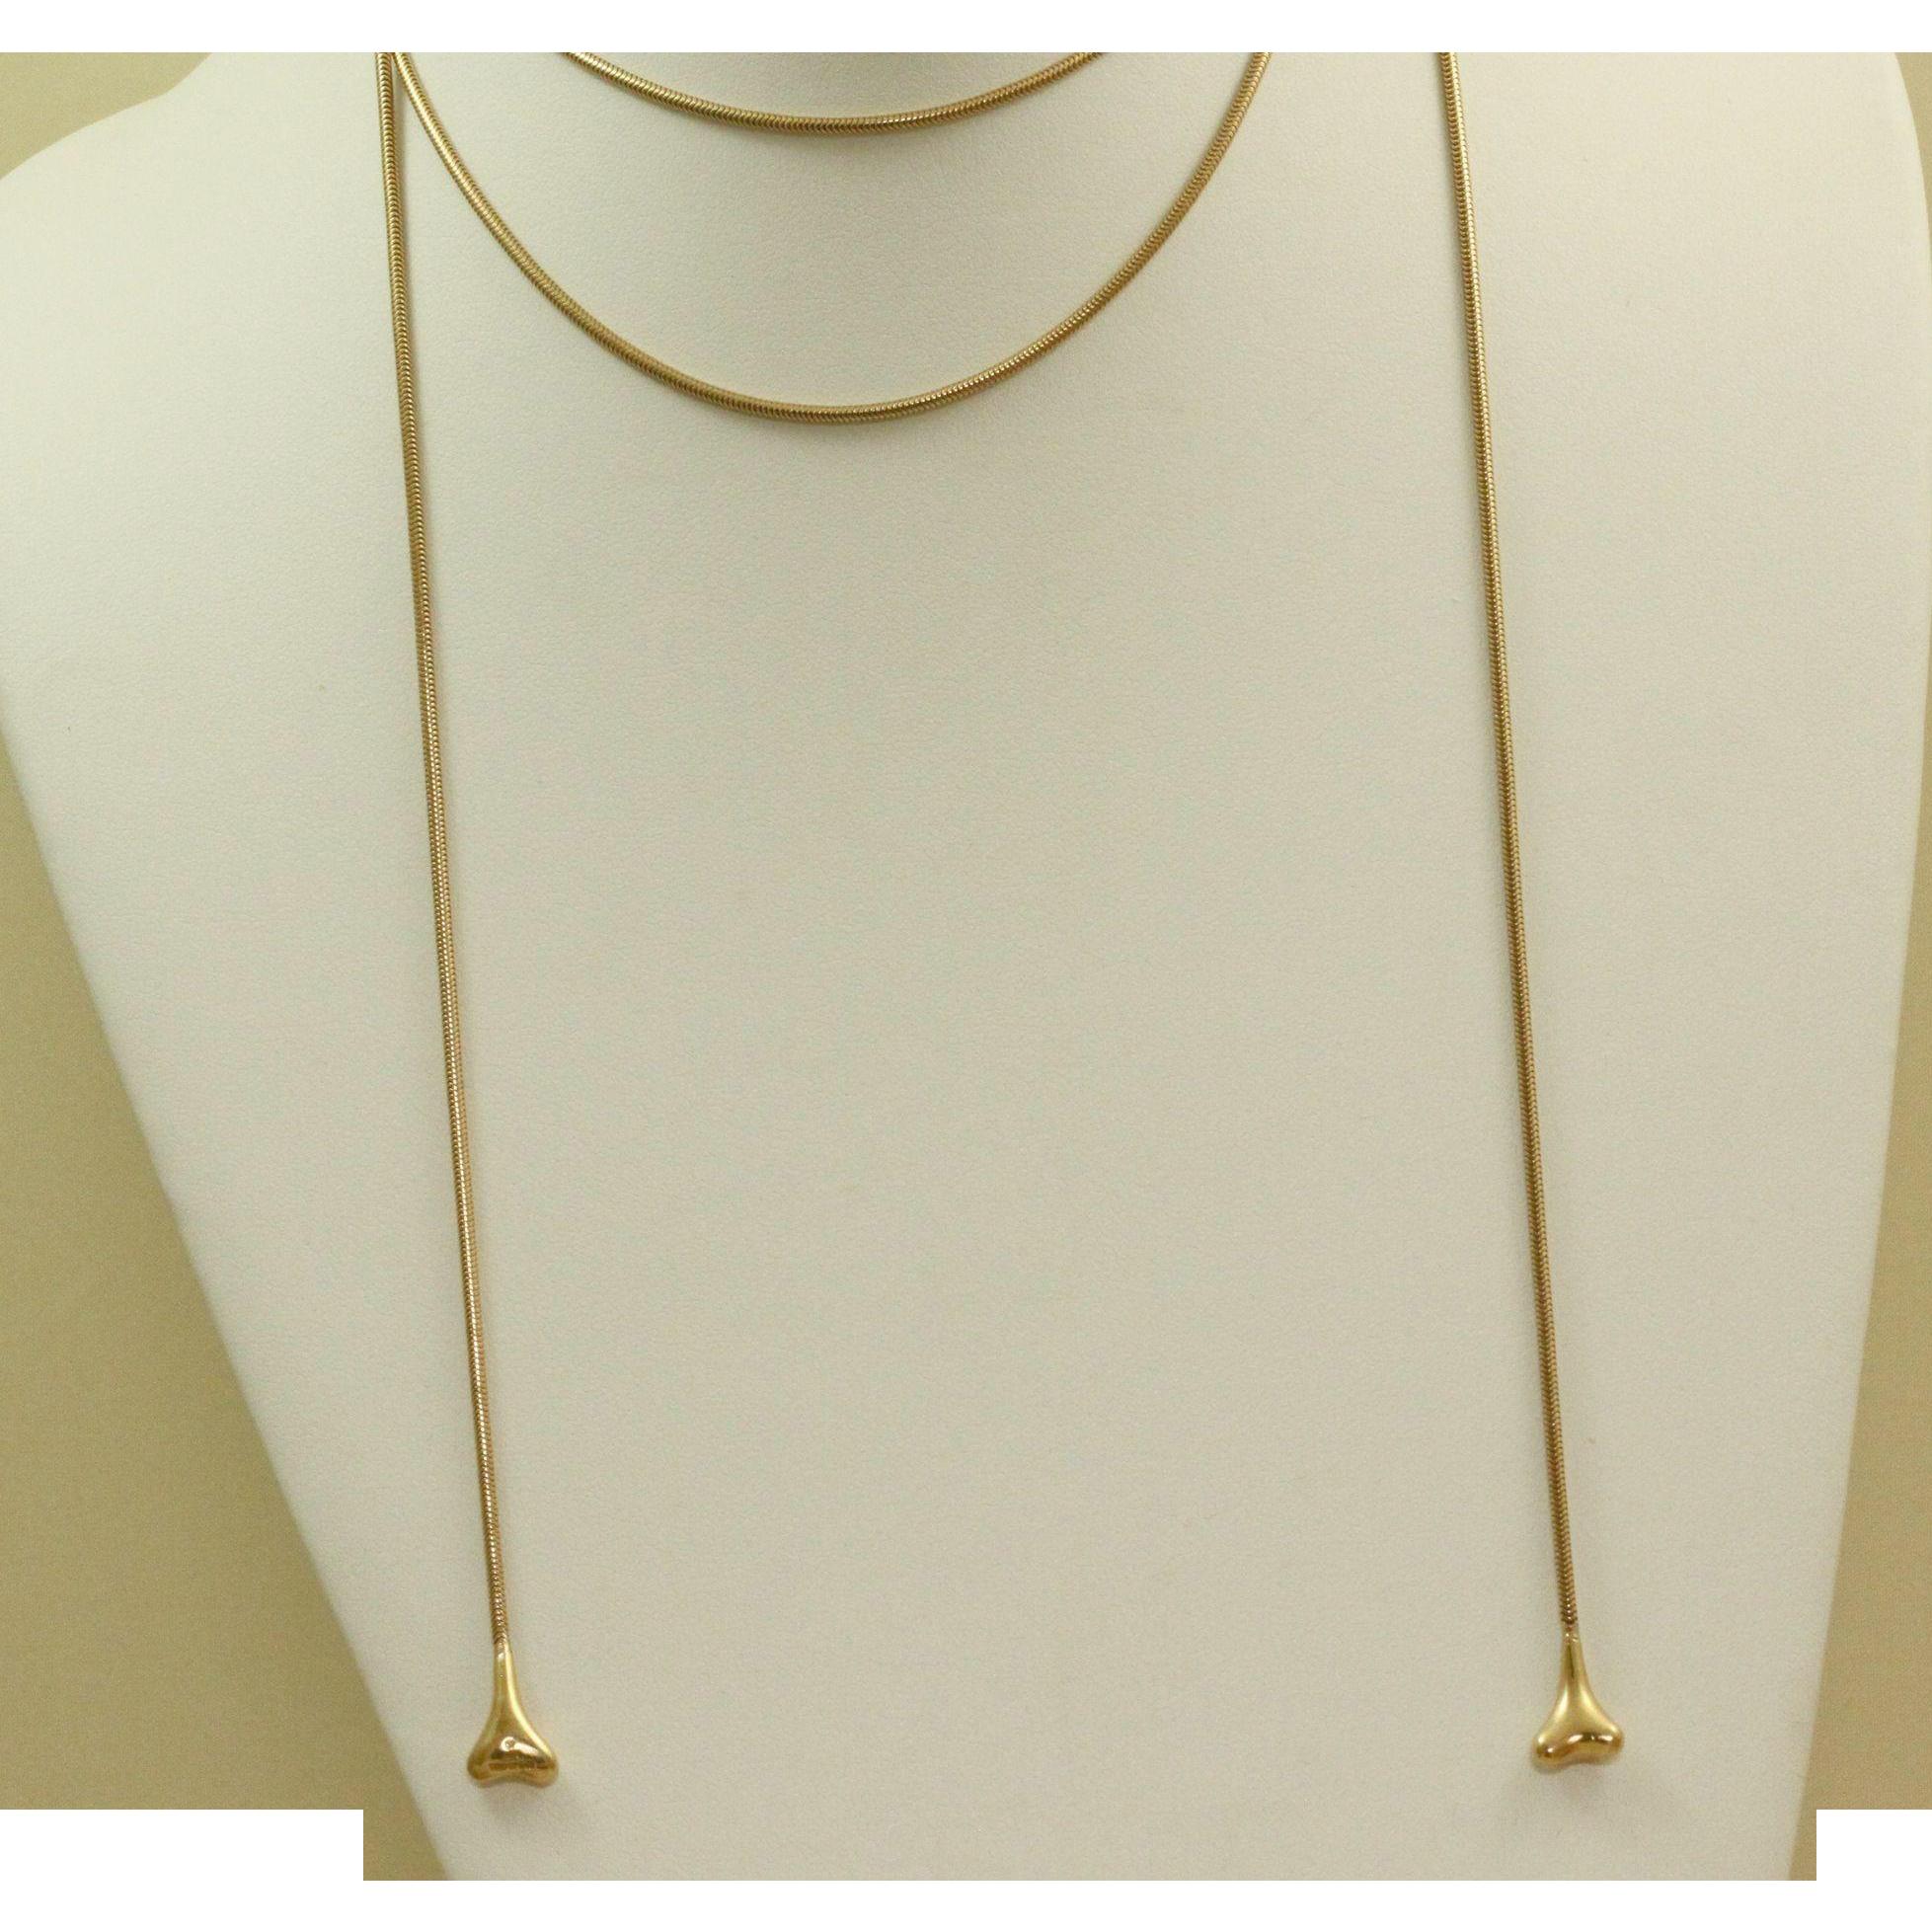 Estate 18 K Tiffany Snake Chain Bone End Lariat Necklace